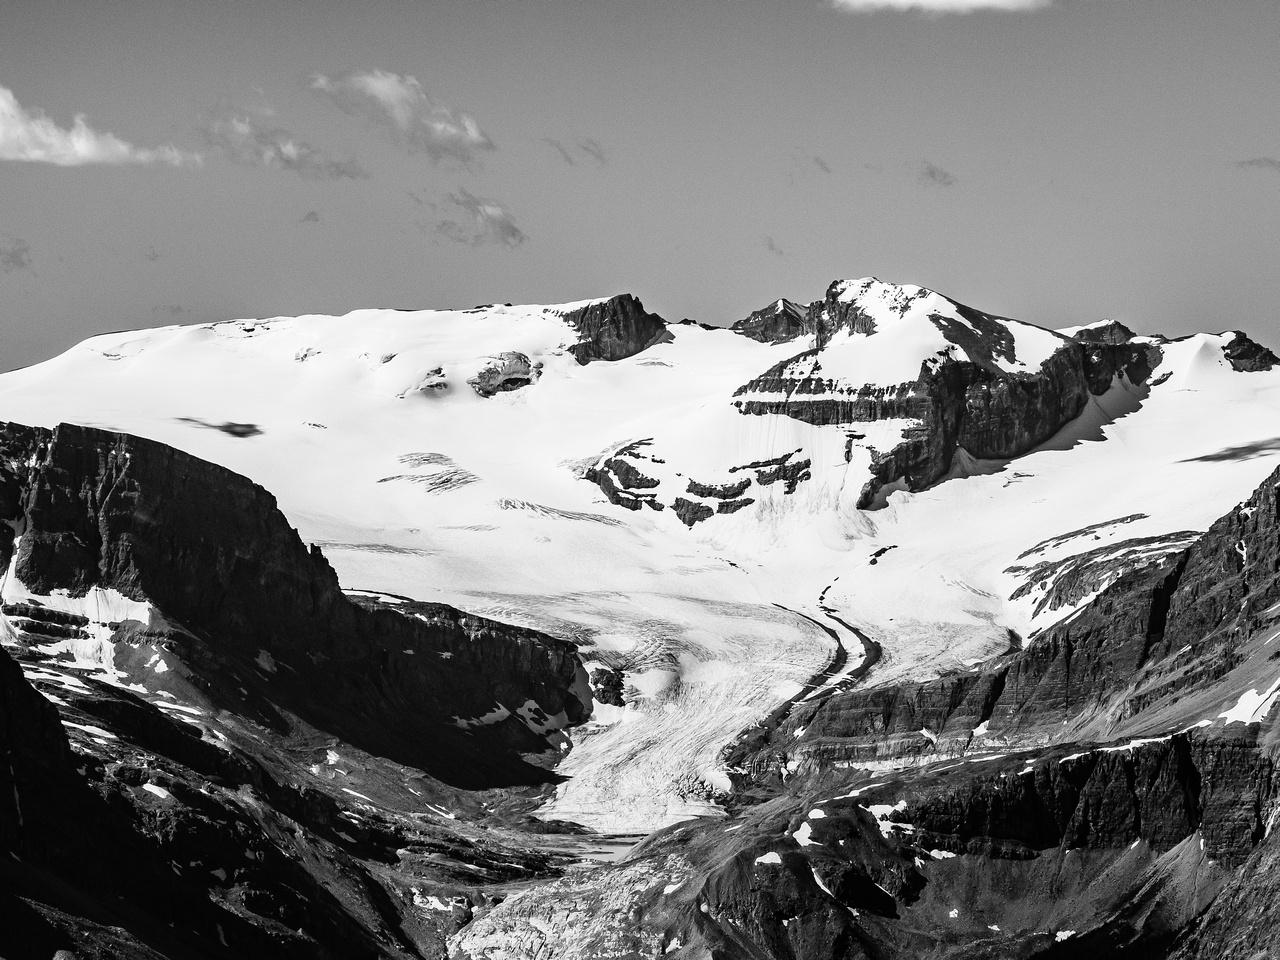 Looking up the shrinking Peyto Glacier towards Mount Rhondda (L) and Habel (R).